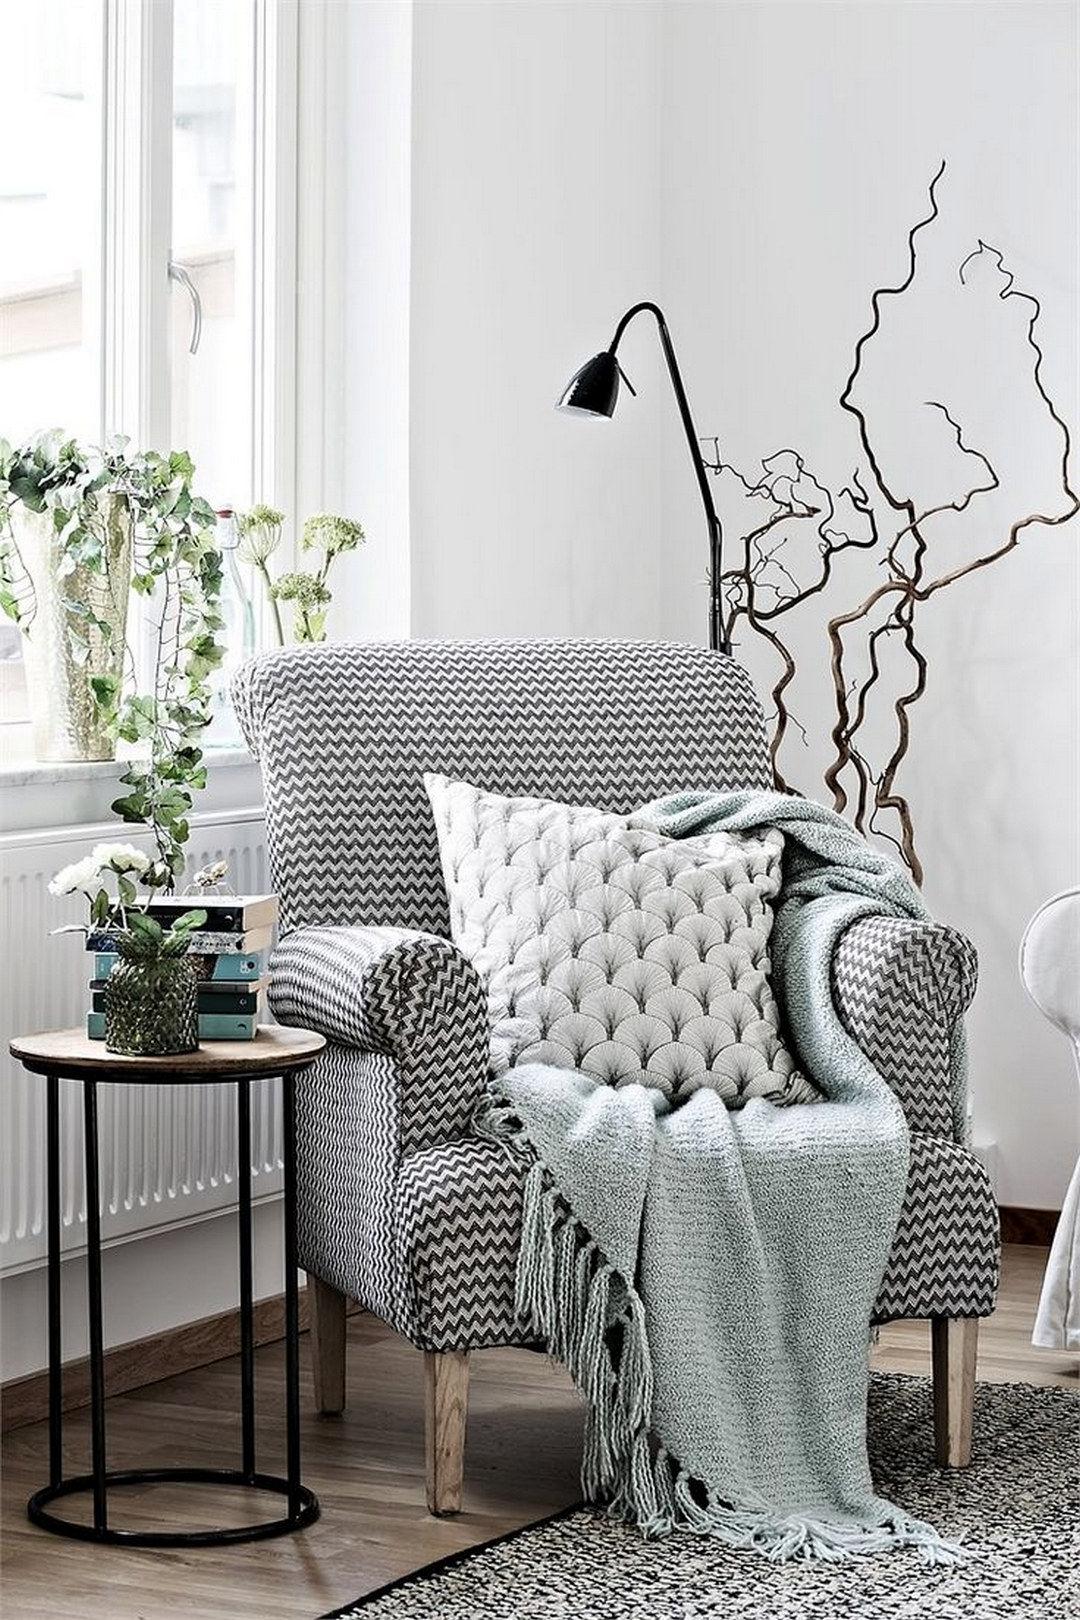 Charmant 79 Fantastic Scandinavian Chair Design Ideas |